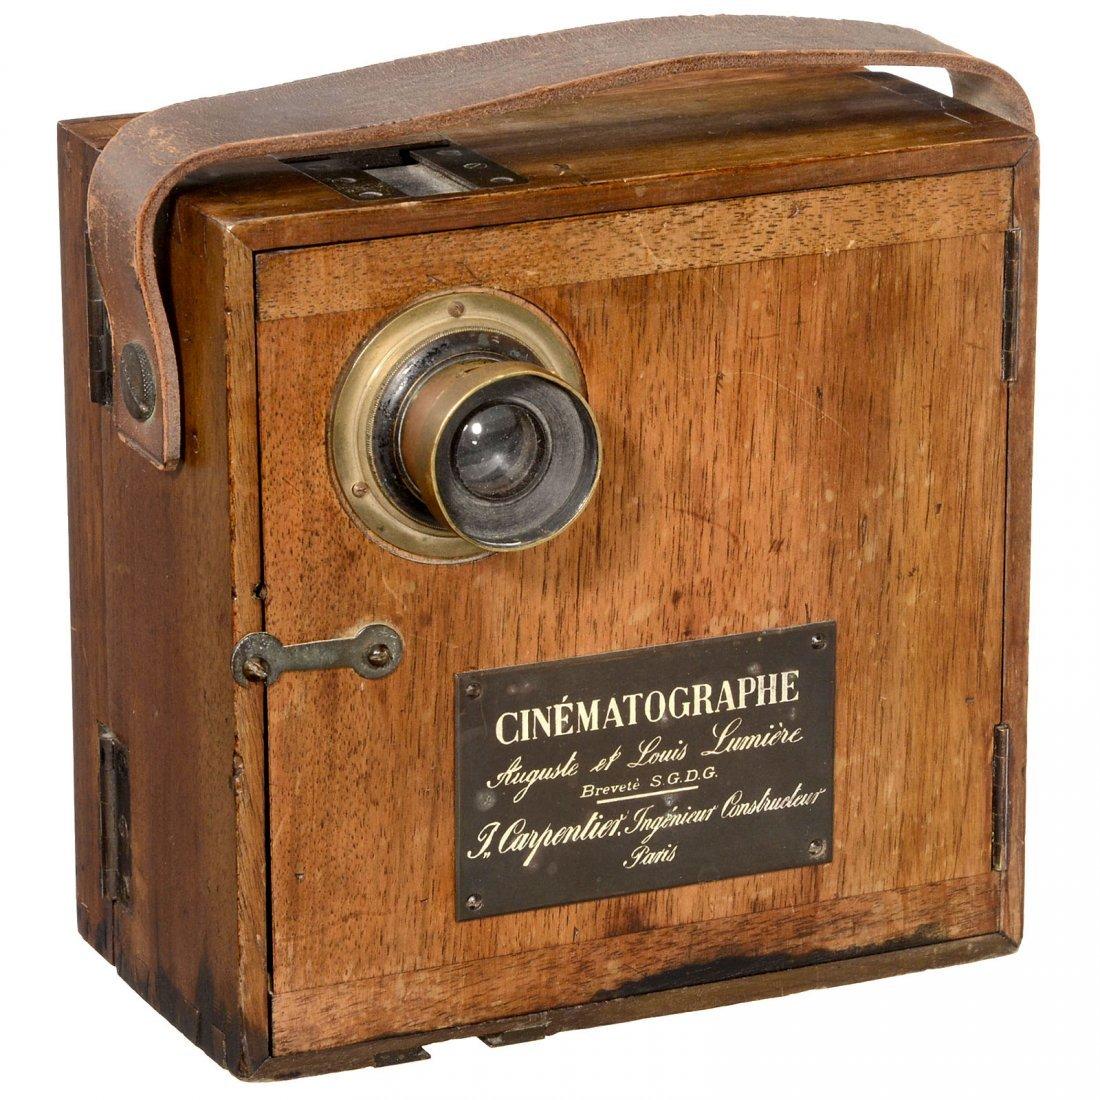 "Sensational Milestone: ""Cinématographe Lumière"", from"